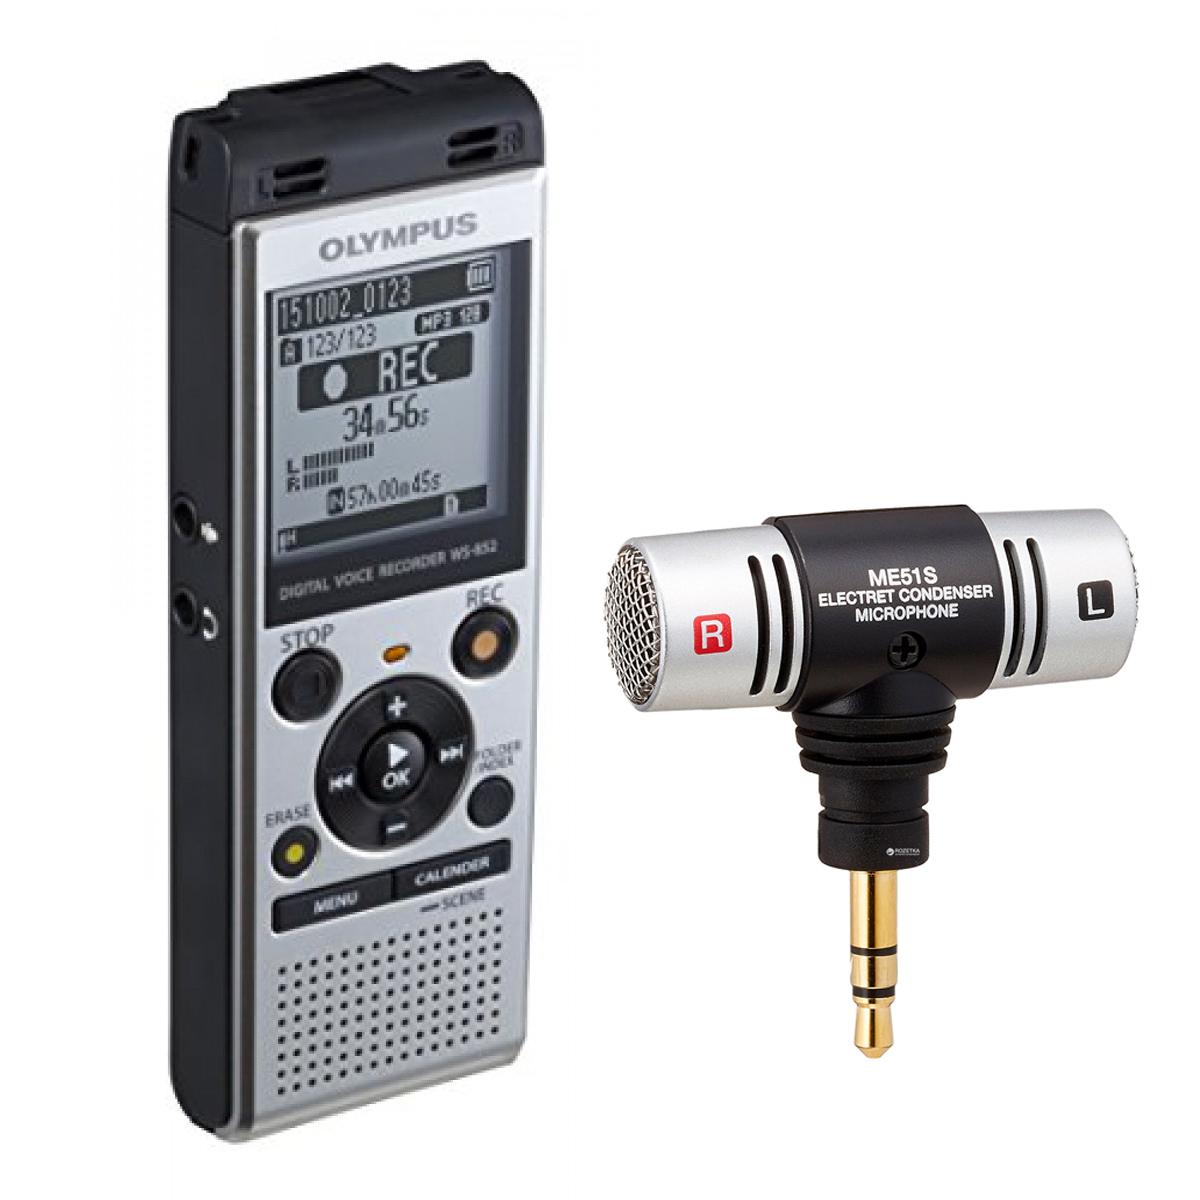 Olympus WS-852 4GB Digital Notetaker with ME51 Microphone